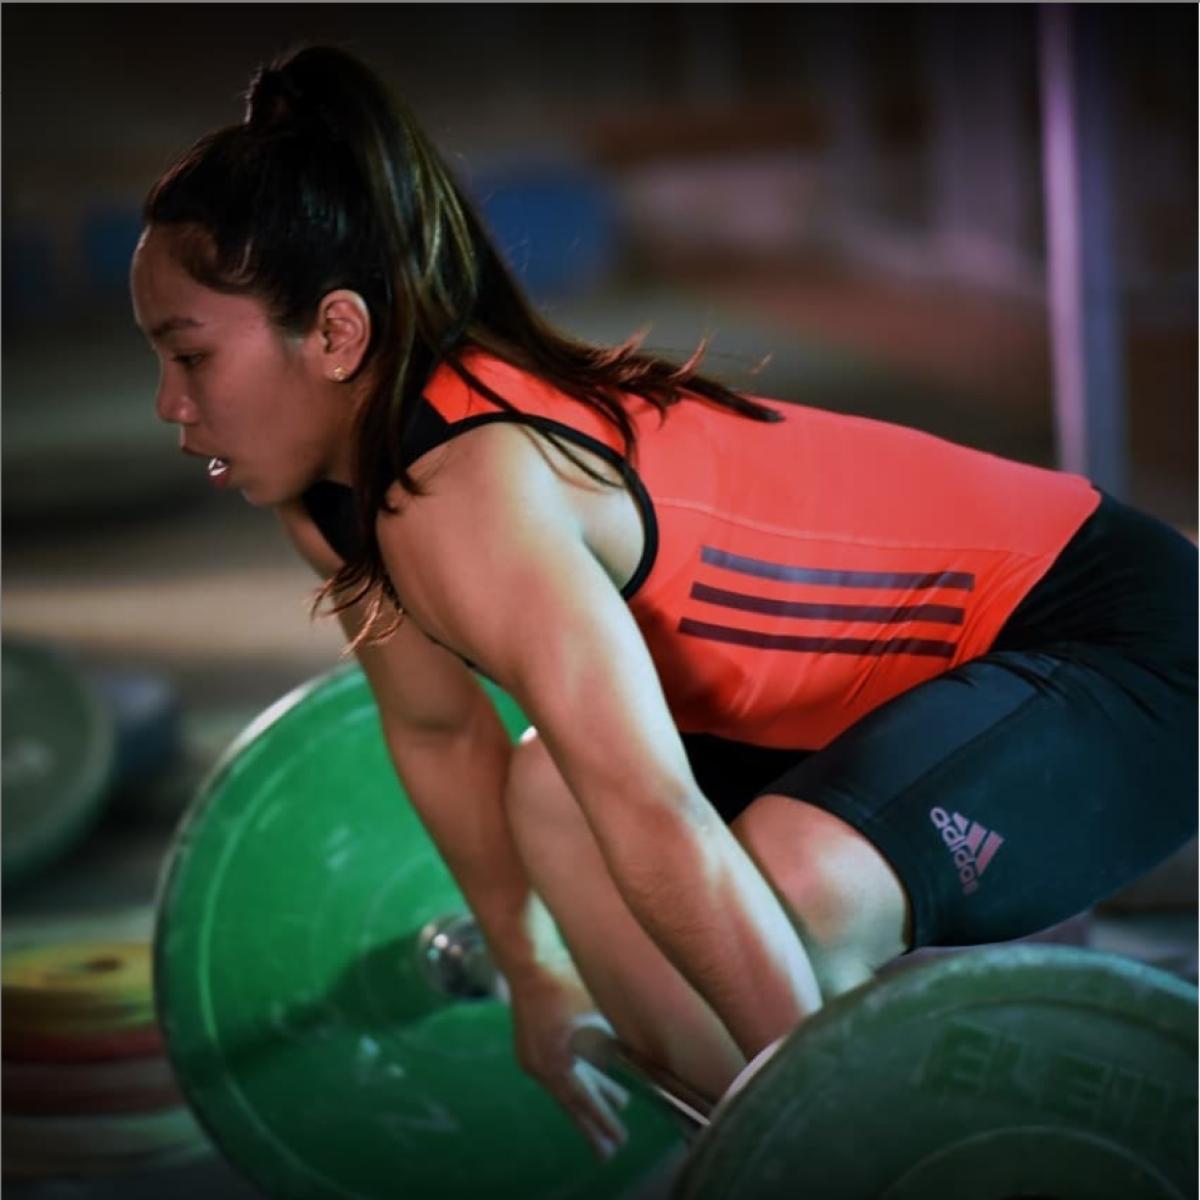 Weightlifting federation nominates Khel Ratna recipient Mirabai Chanu for Arjuna award